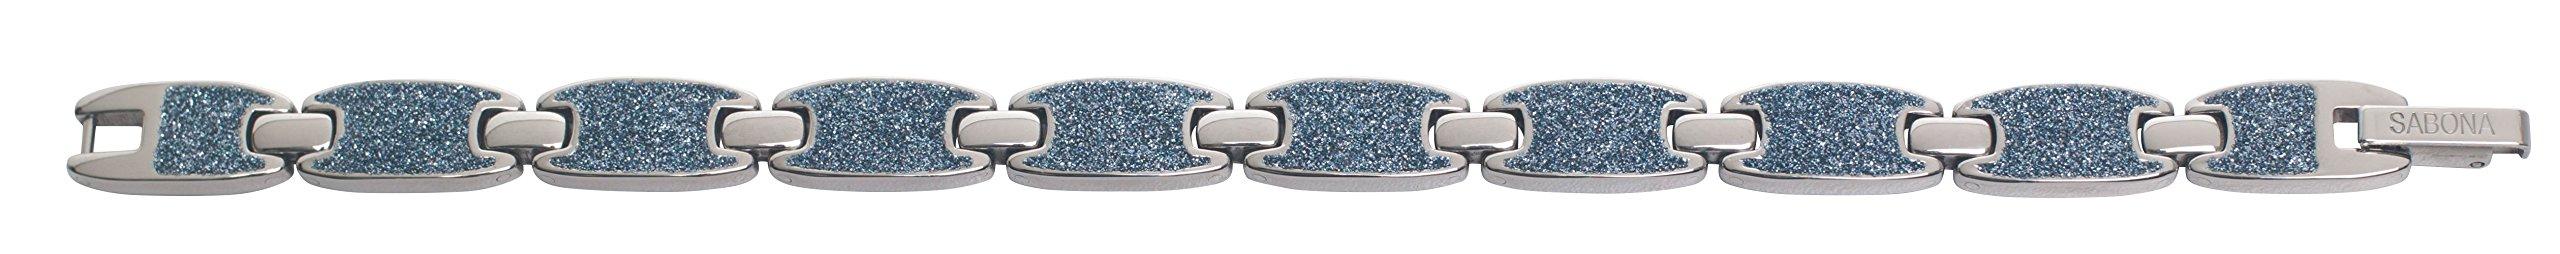 Sabona 28165 Caribbean Ocean Magnetic Bracelet in Silver, 0.1 Ounce by Sabona (Image #2)